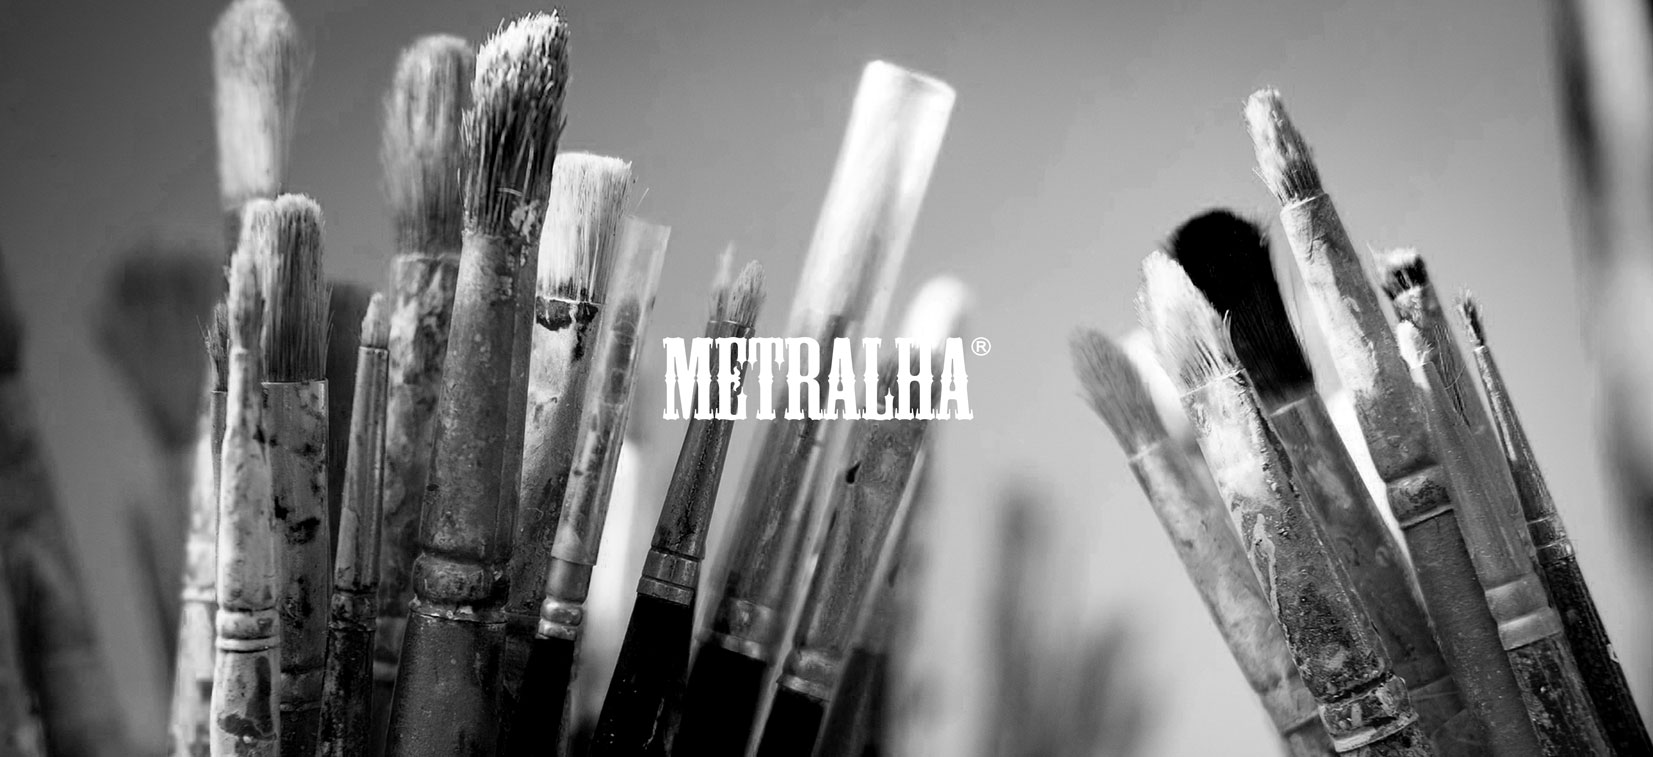 Metralha Creative Contest